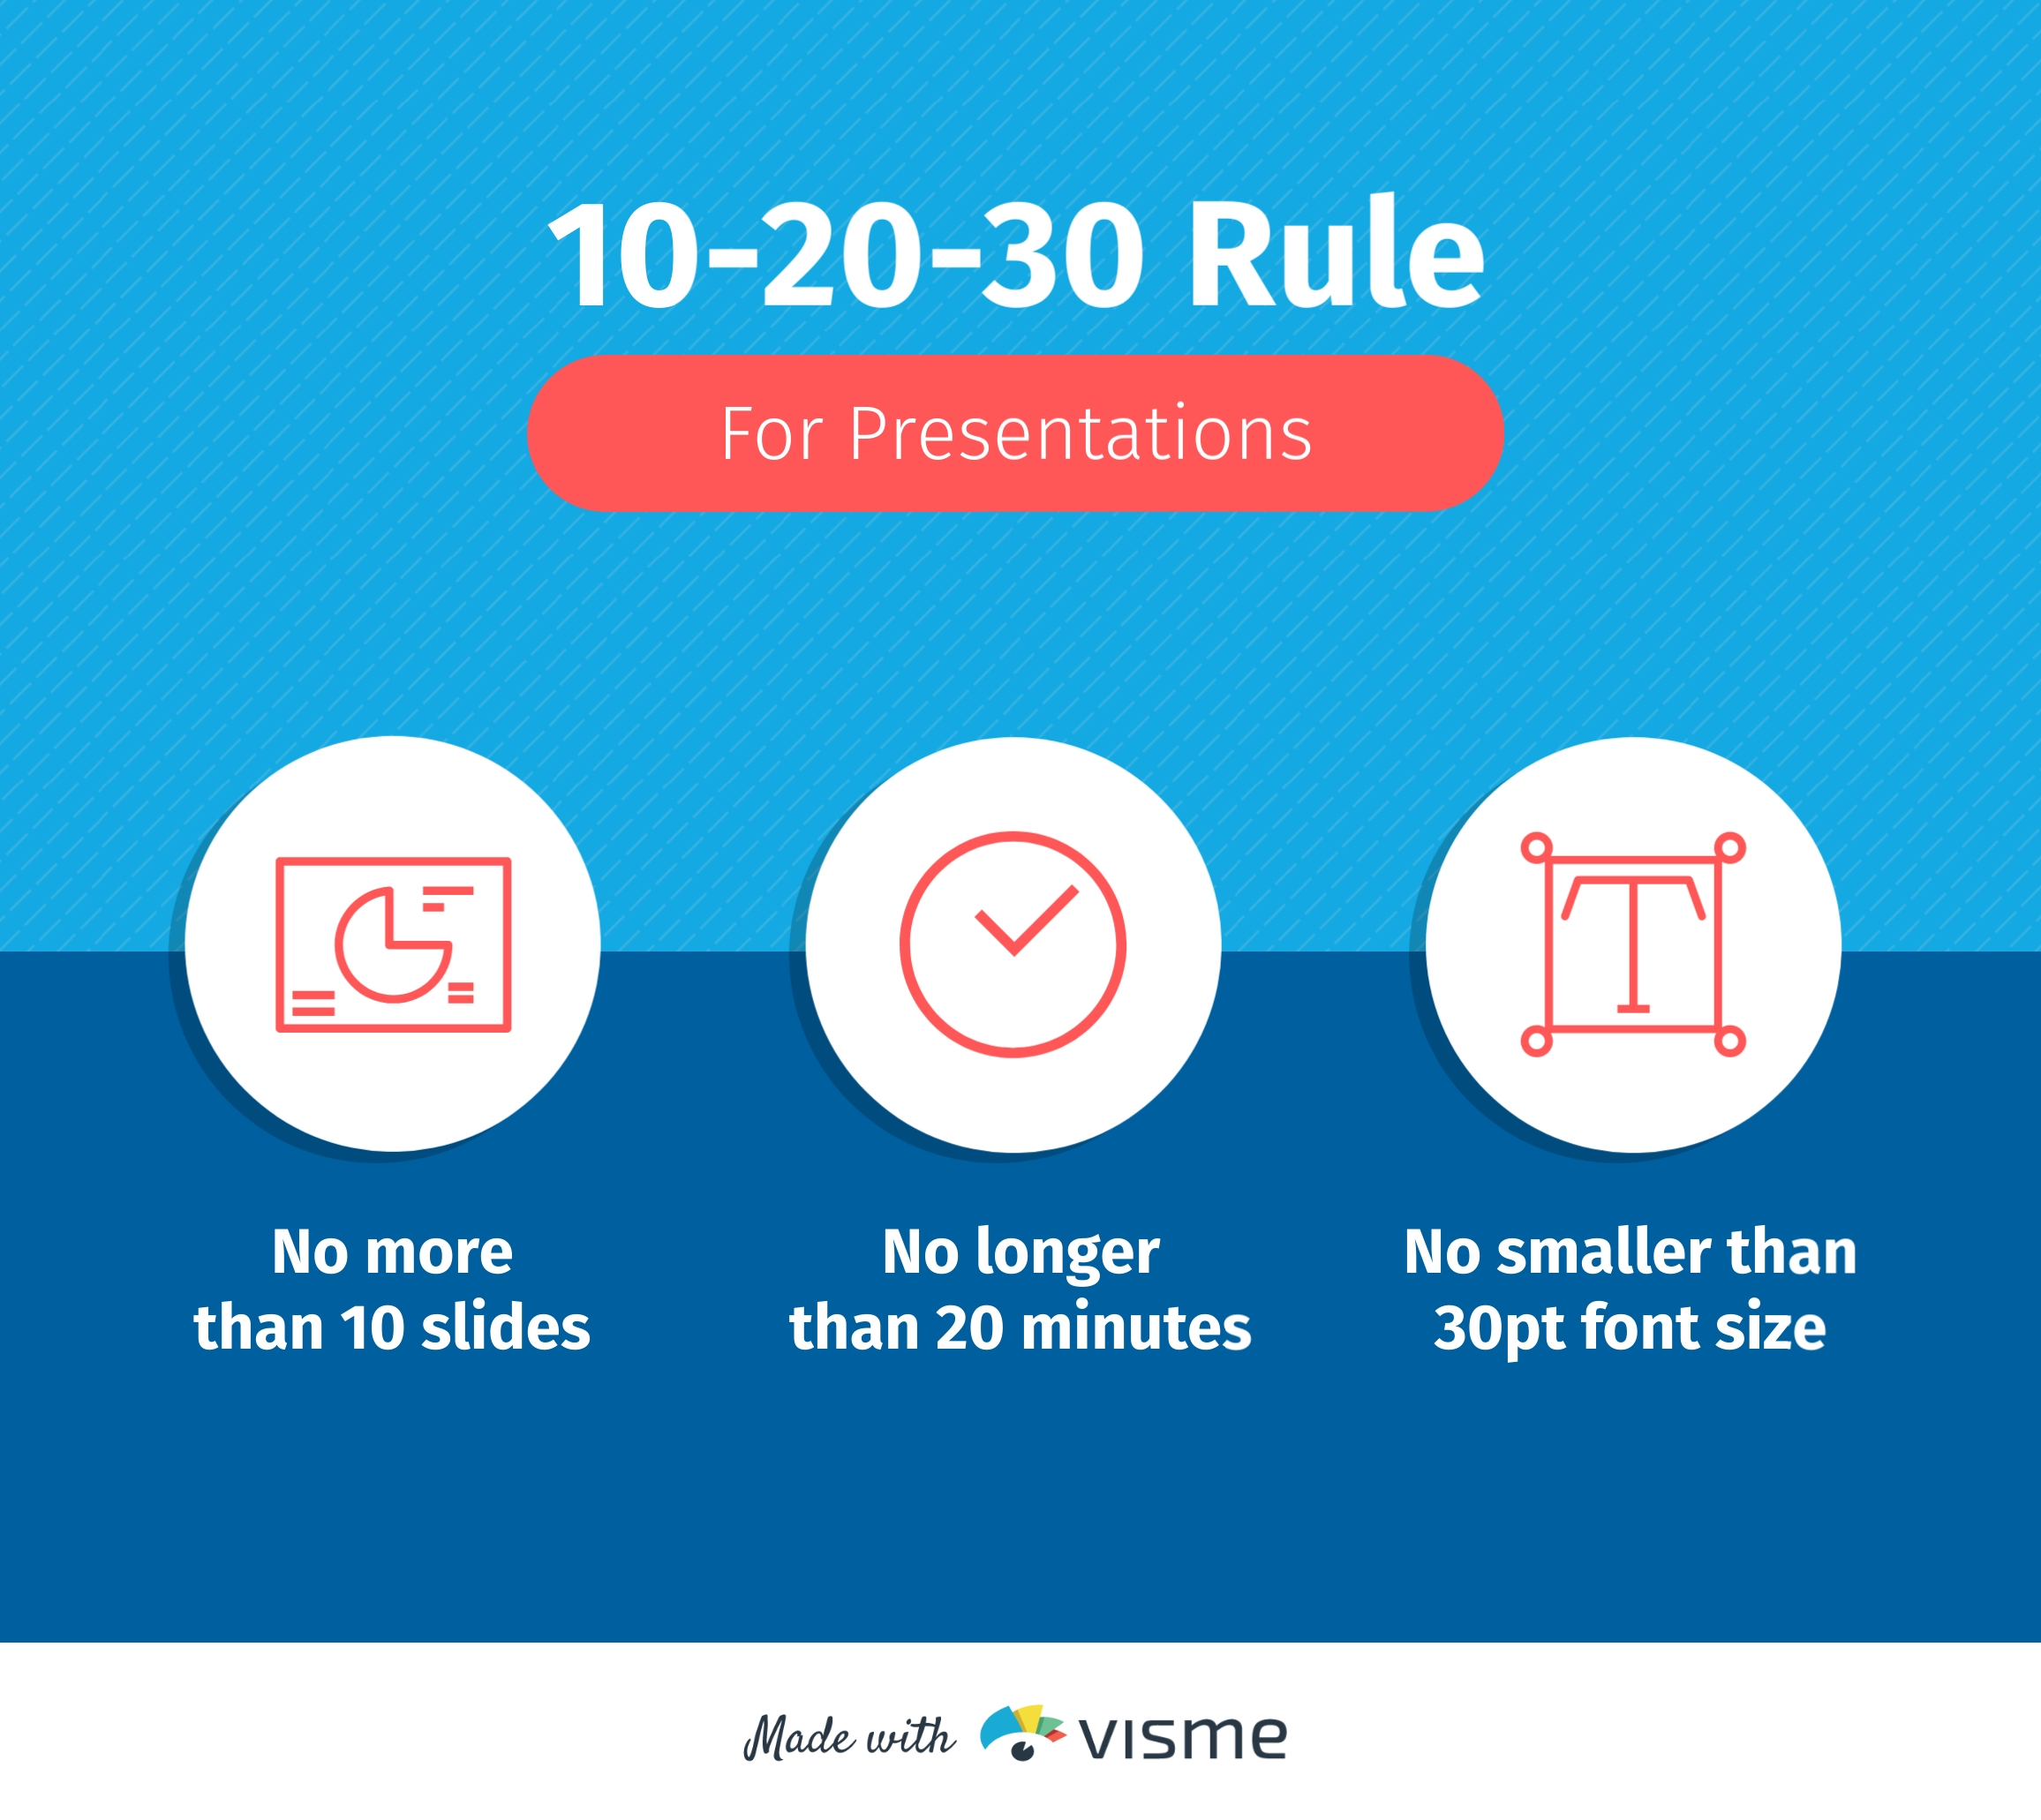 business plan presentation - 10-20-30 rule for presentations